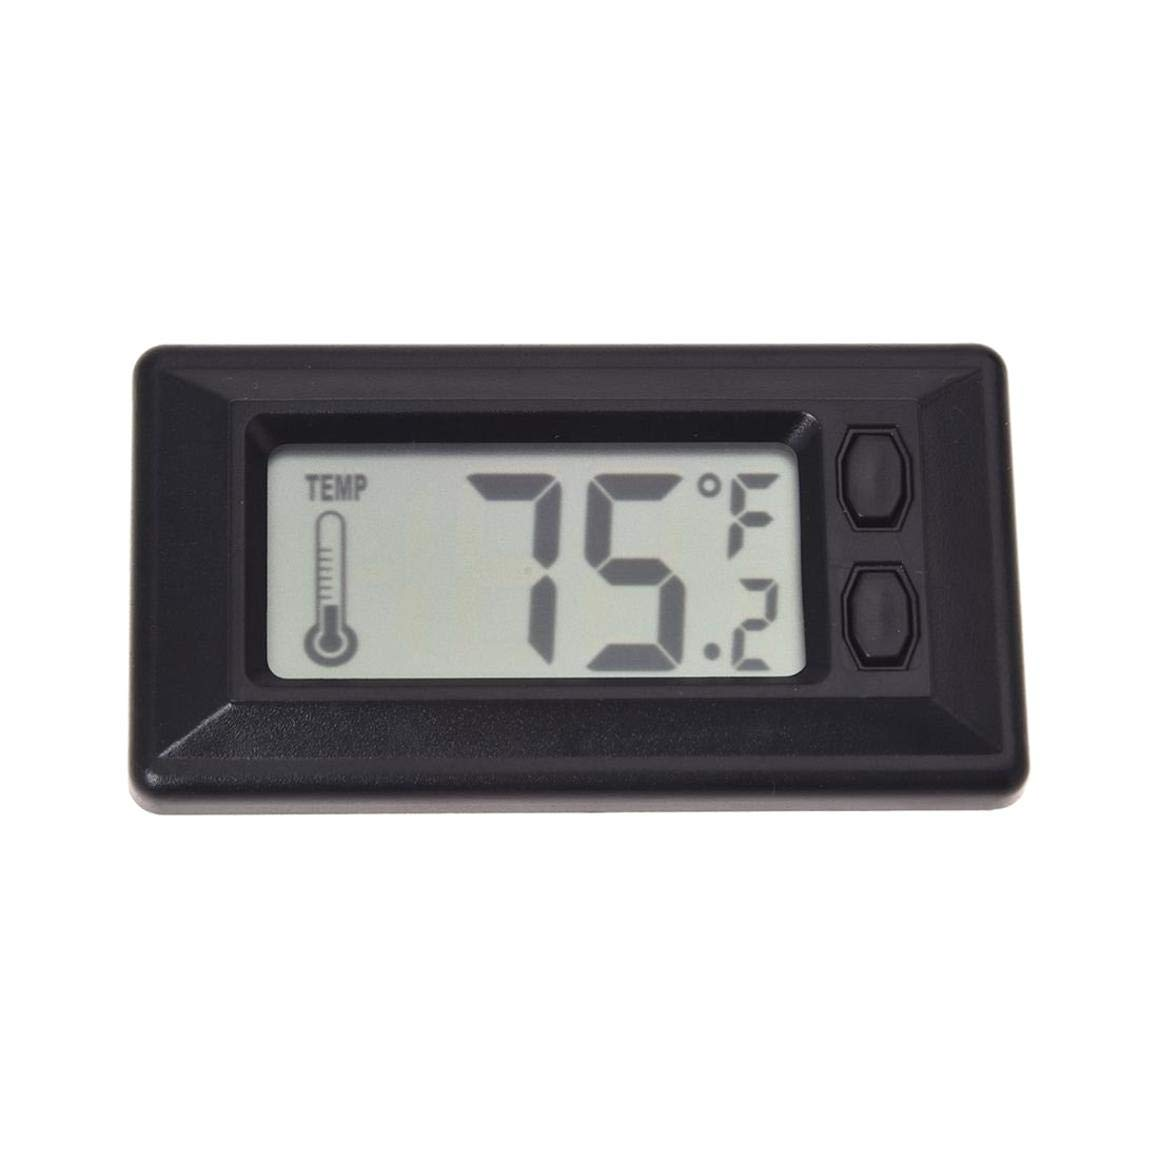 DeoMeat Term/ómetro para autom/óvil Term/ómetro Digital de Temperatura Interior Pantalla LCD